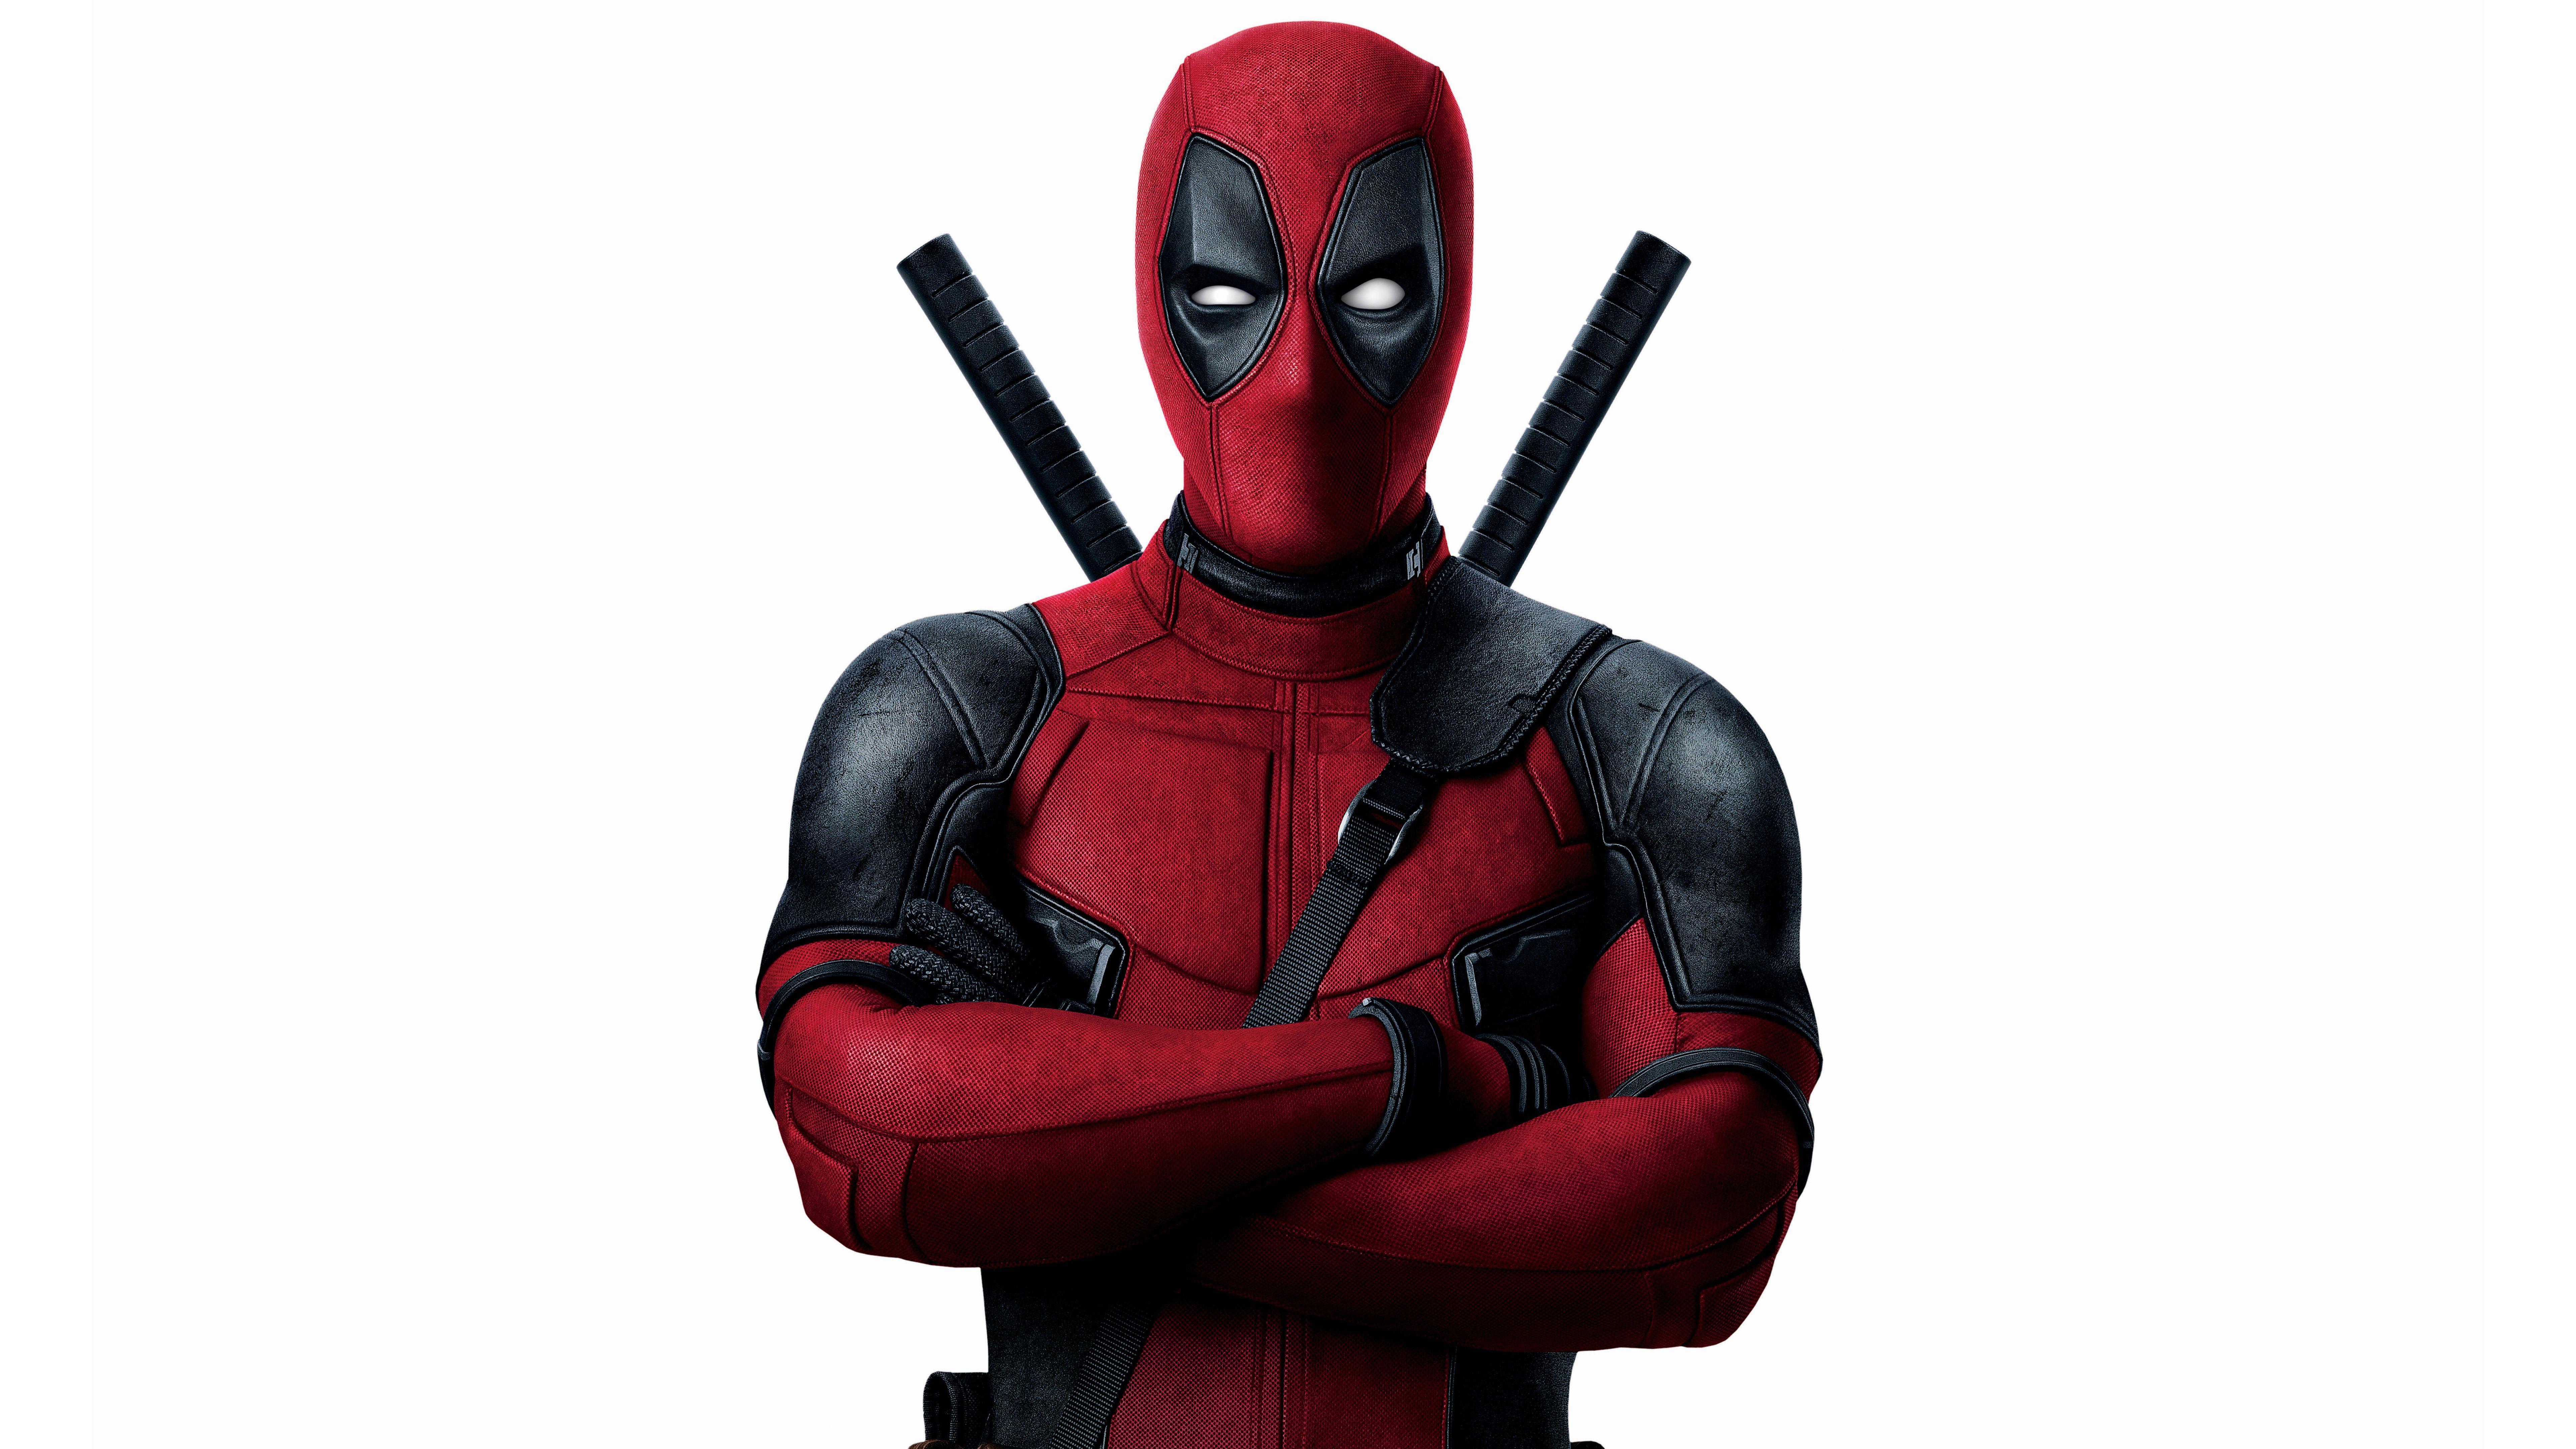 Deadpool 4k Wallpapers Top Free Deadpool 4k Backgrounds Wallpaperaccess